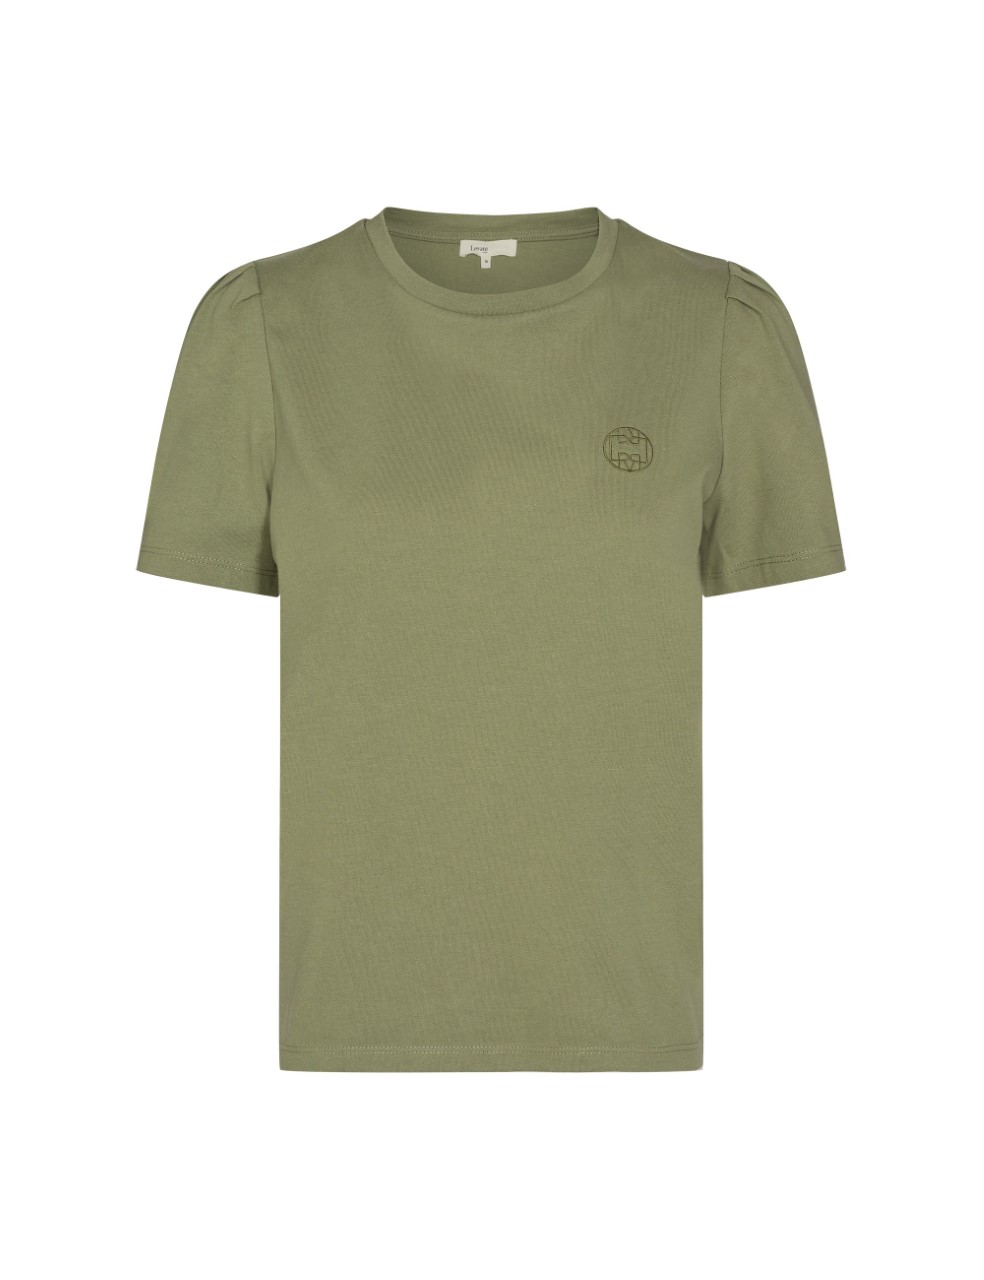 Leveteroom Islo T-shirt